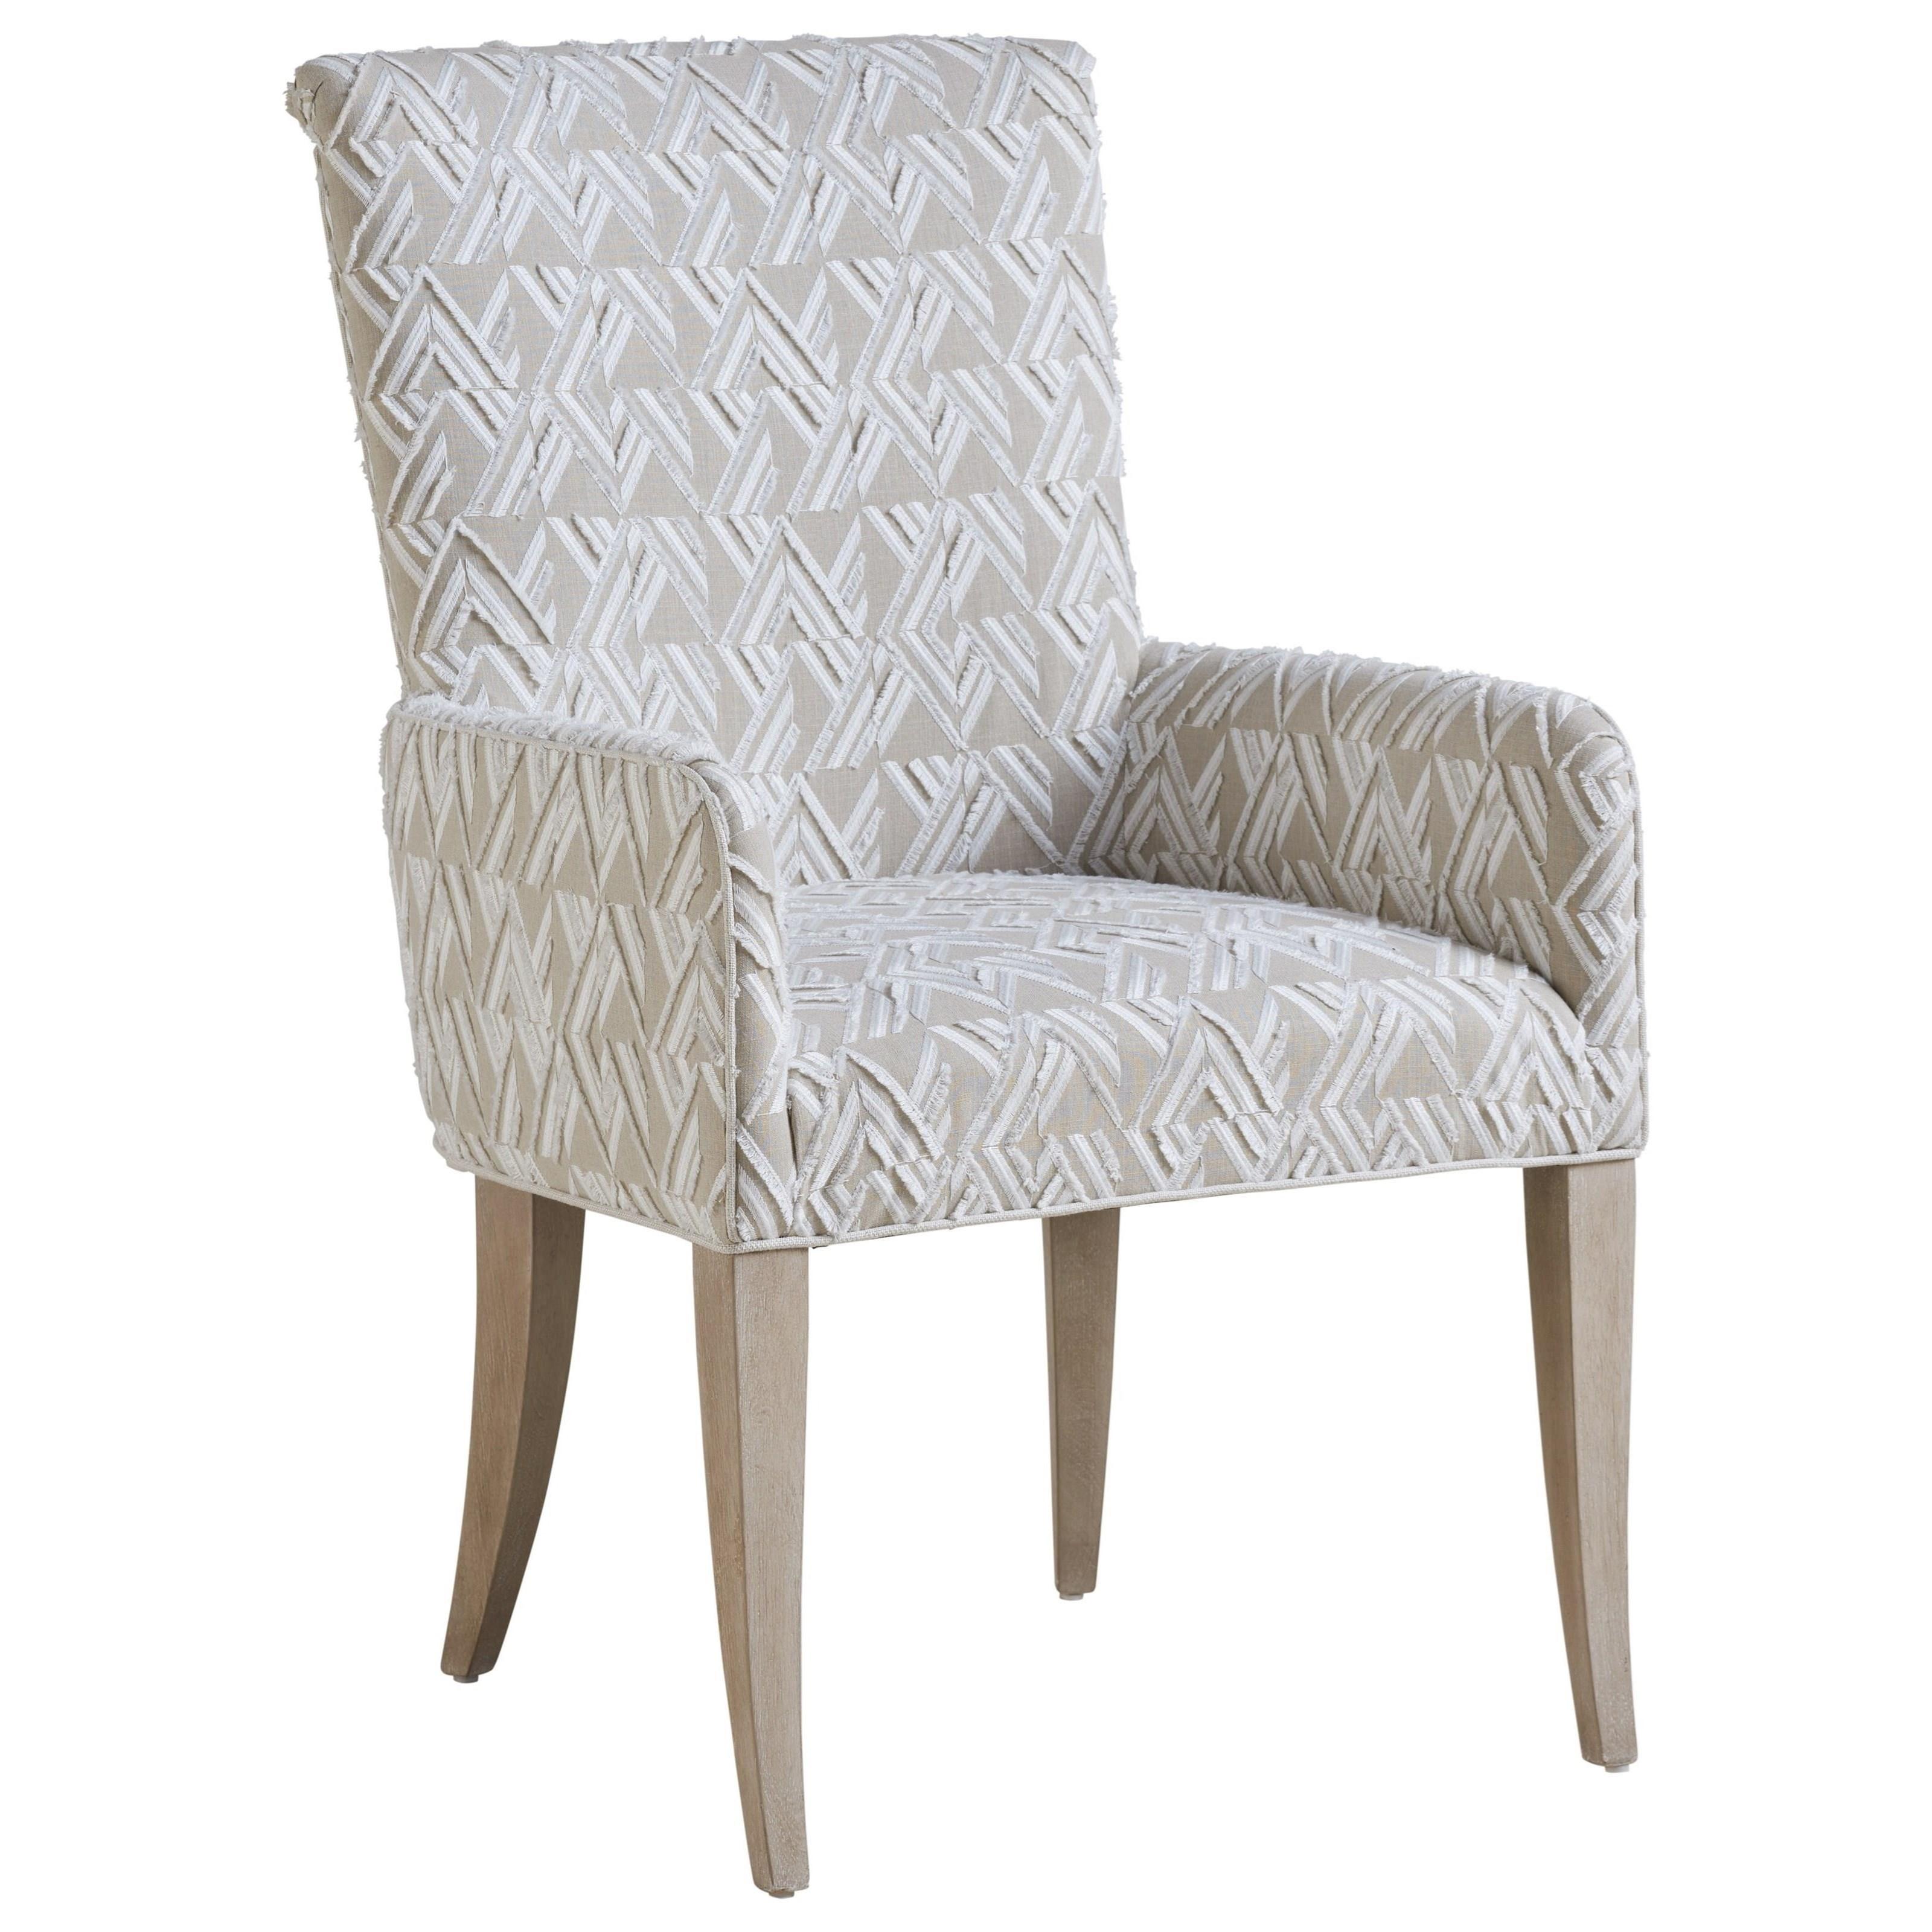 Malibu Serra Upholstered Arm Chair by Barclay Butera at Baer's Furniture